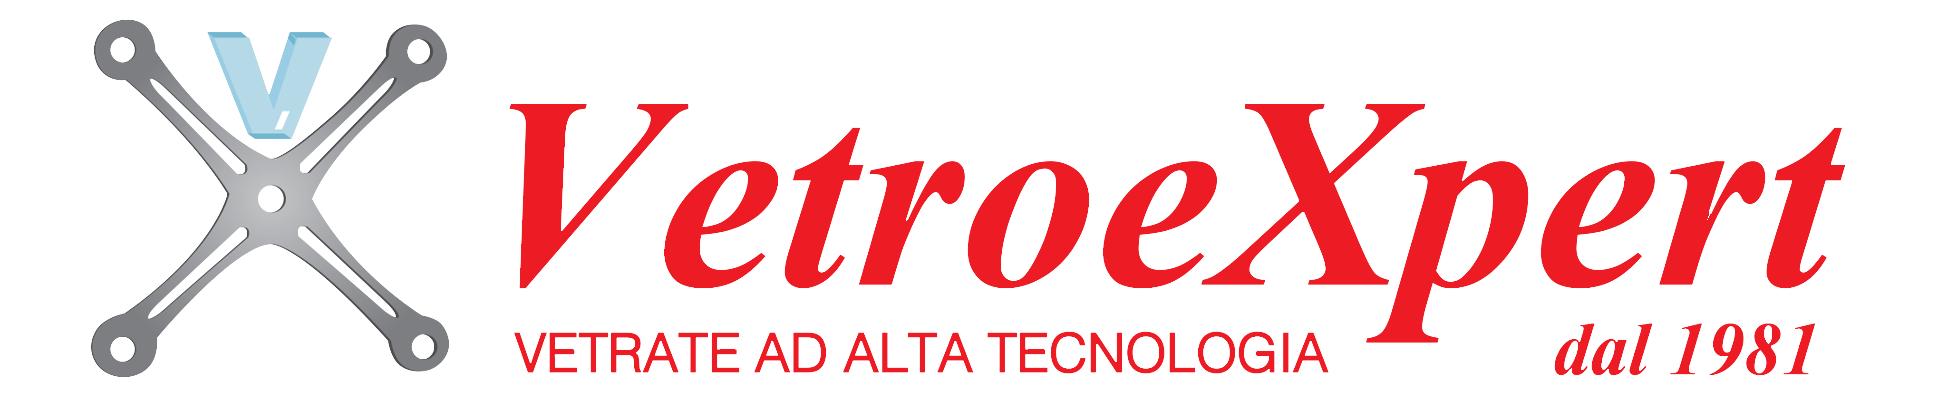 VetroeXpert